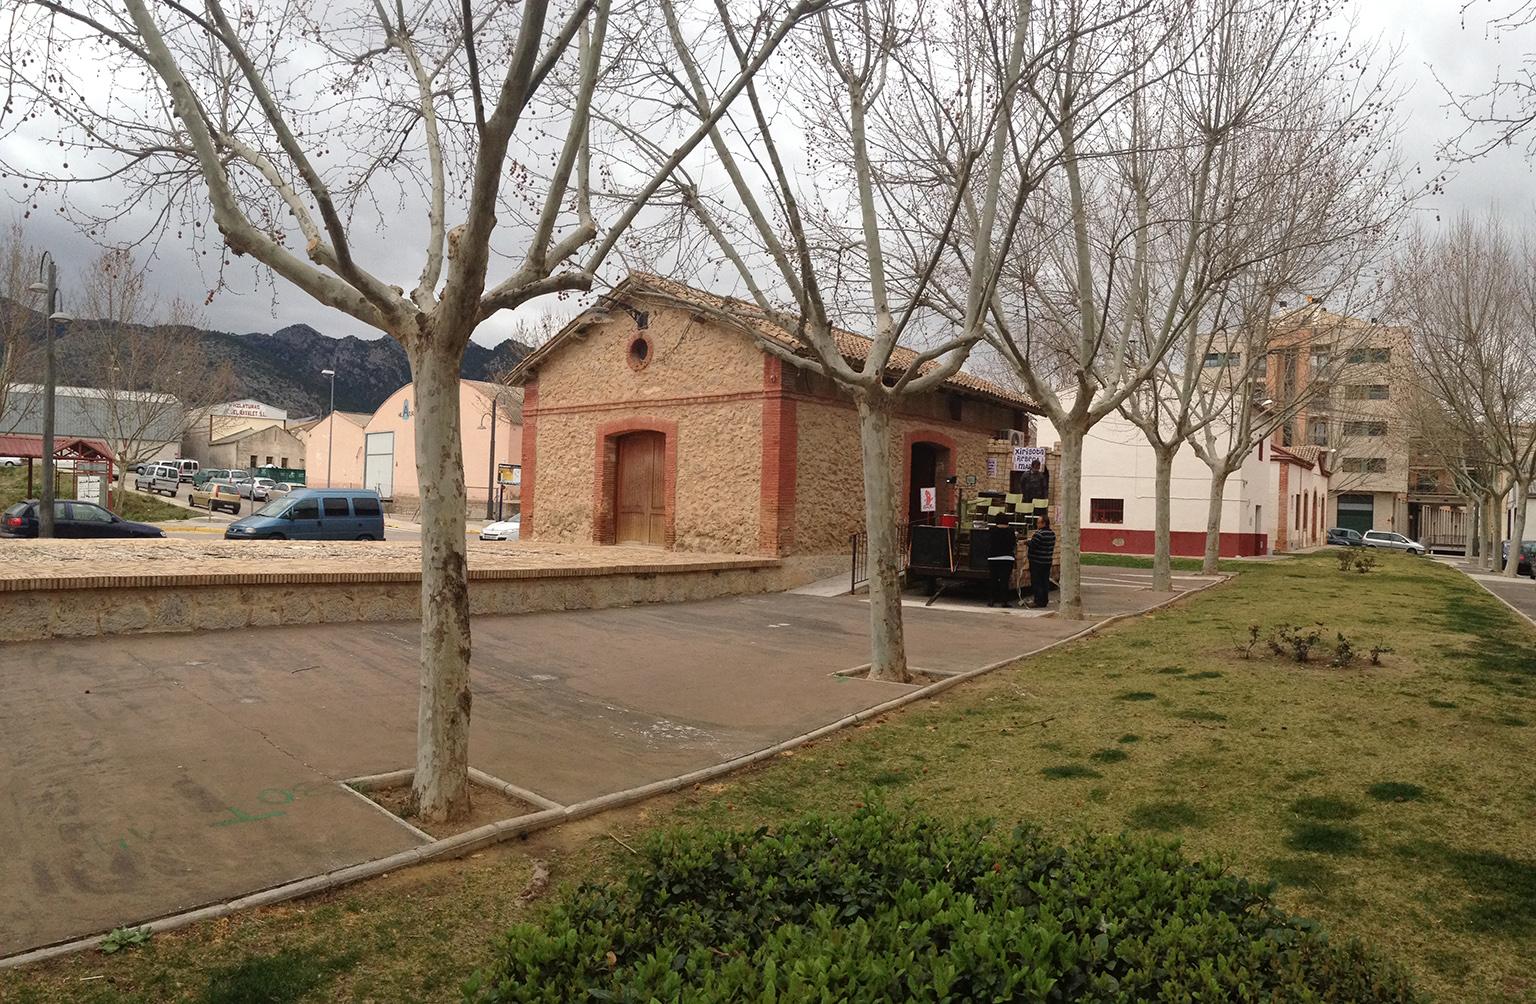 2014-03-01 Carnestoltes - Xirigota Rebeca Mare-RAF.MOBIL (5)